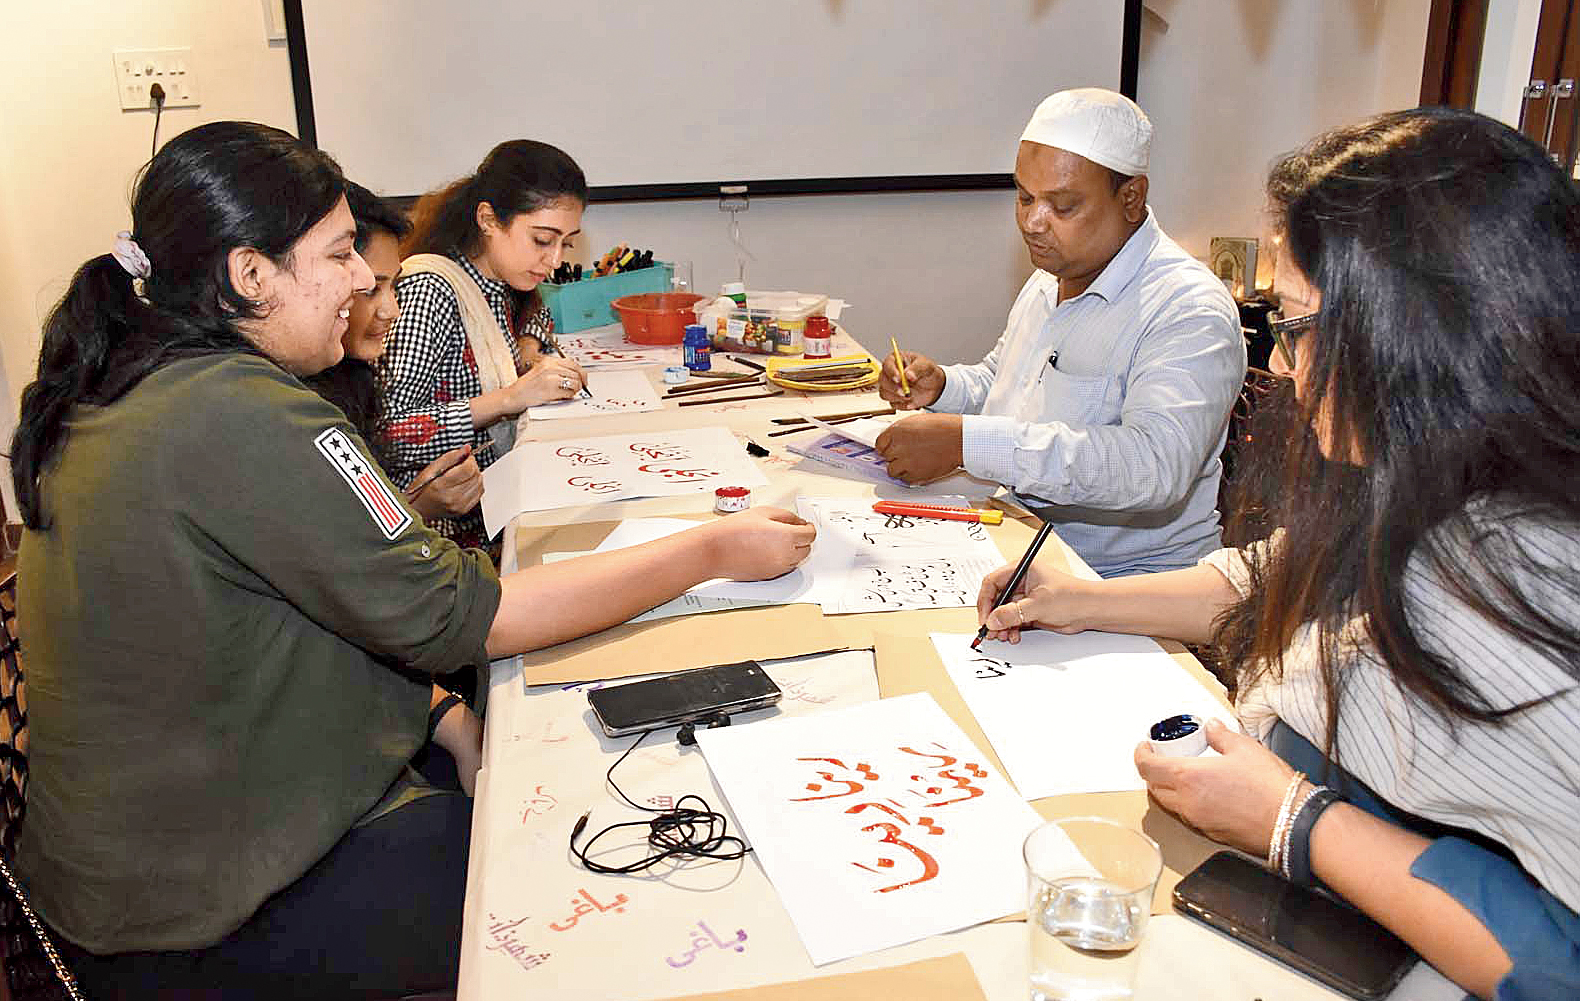 Urdu calligraphy artist Usman Ghani teaches students some fonts at a workshop in Art Rickshaw in Hindustan Park.